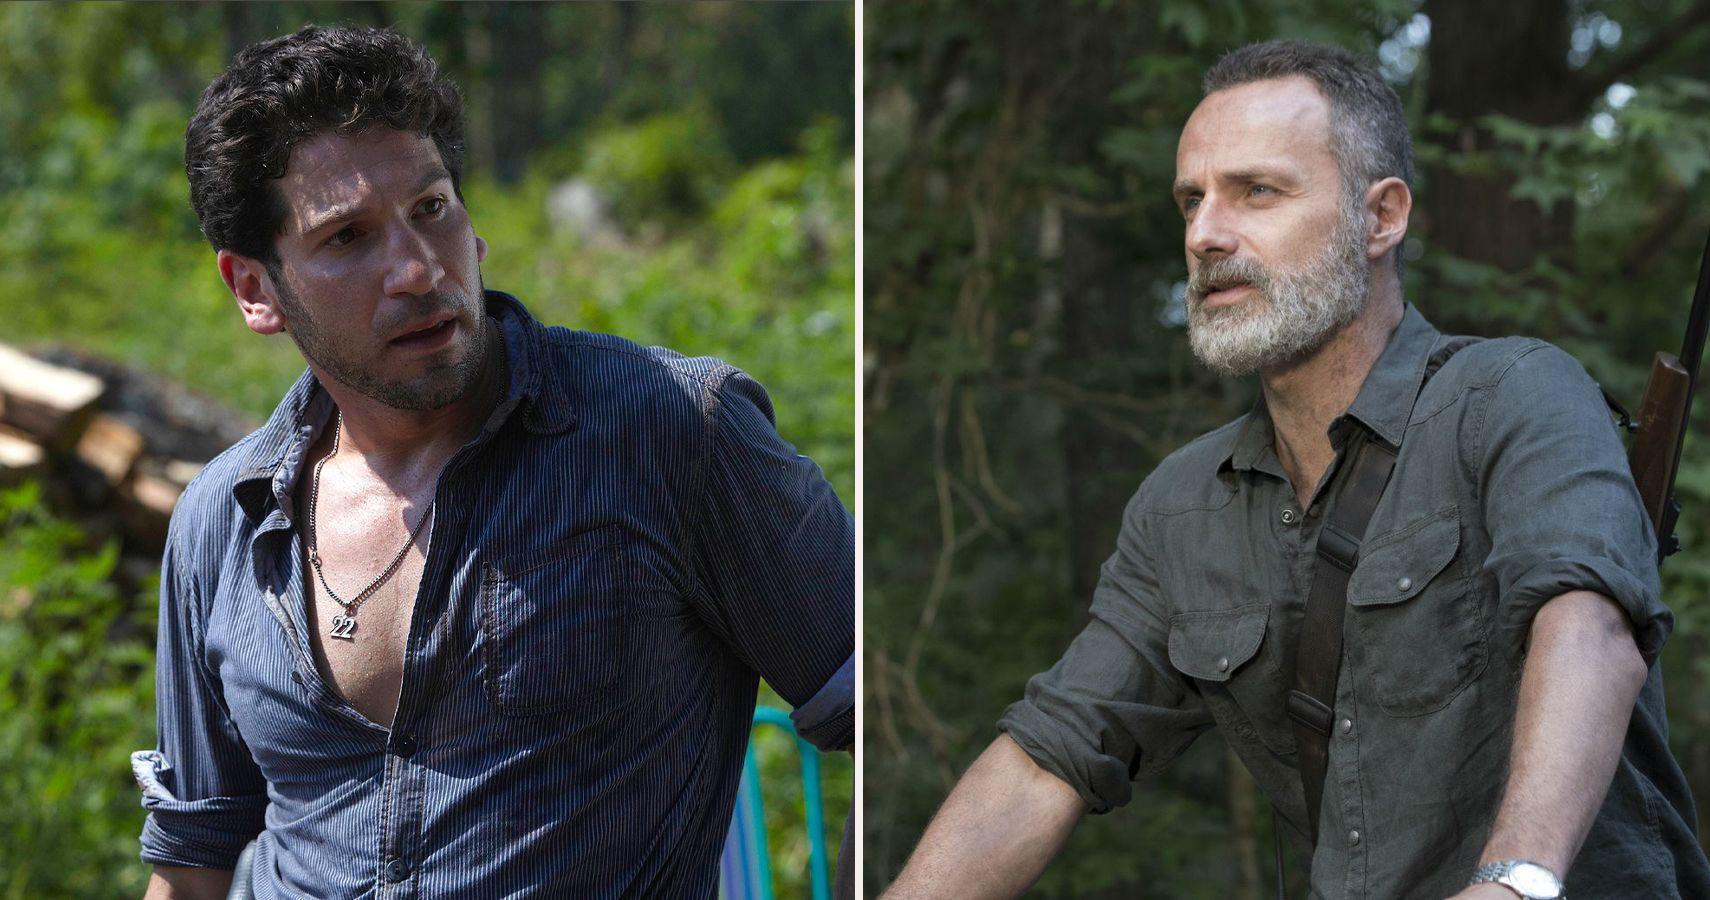 Every Walking Dead Season So Far, Ranked By Their Rotten